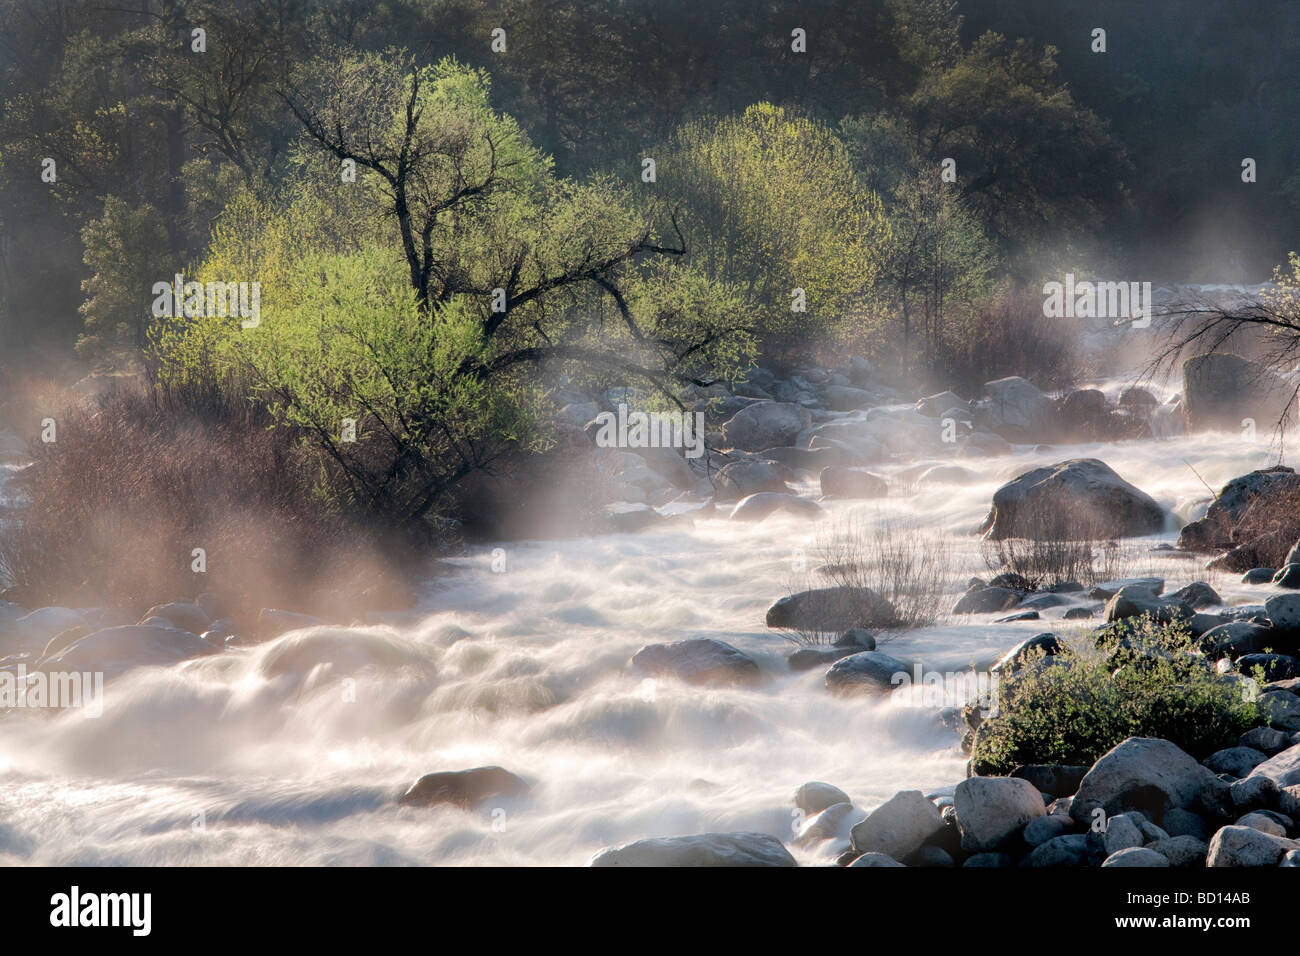 High spring runoff water in Merced River Yosemite National Park California - Stock Image